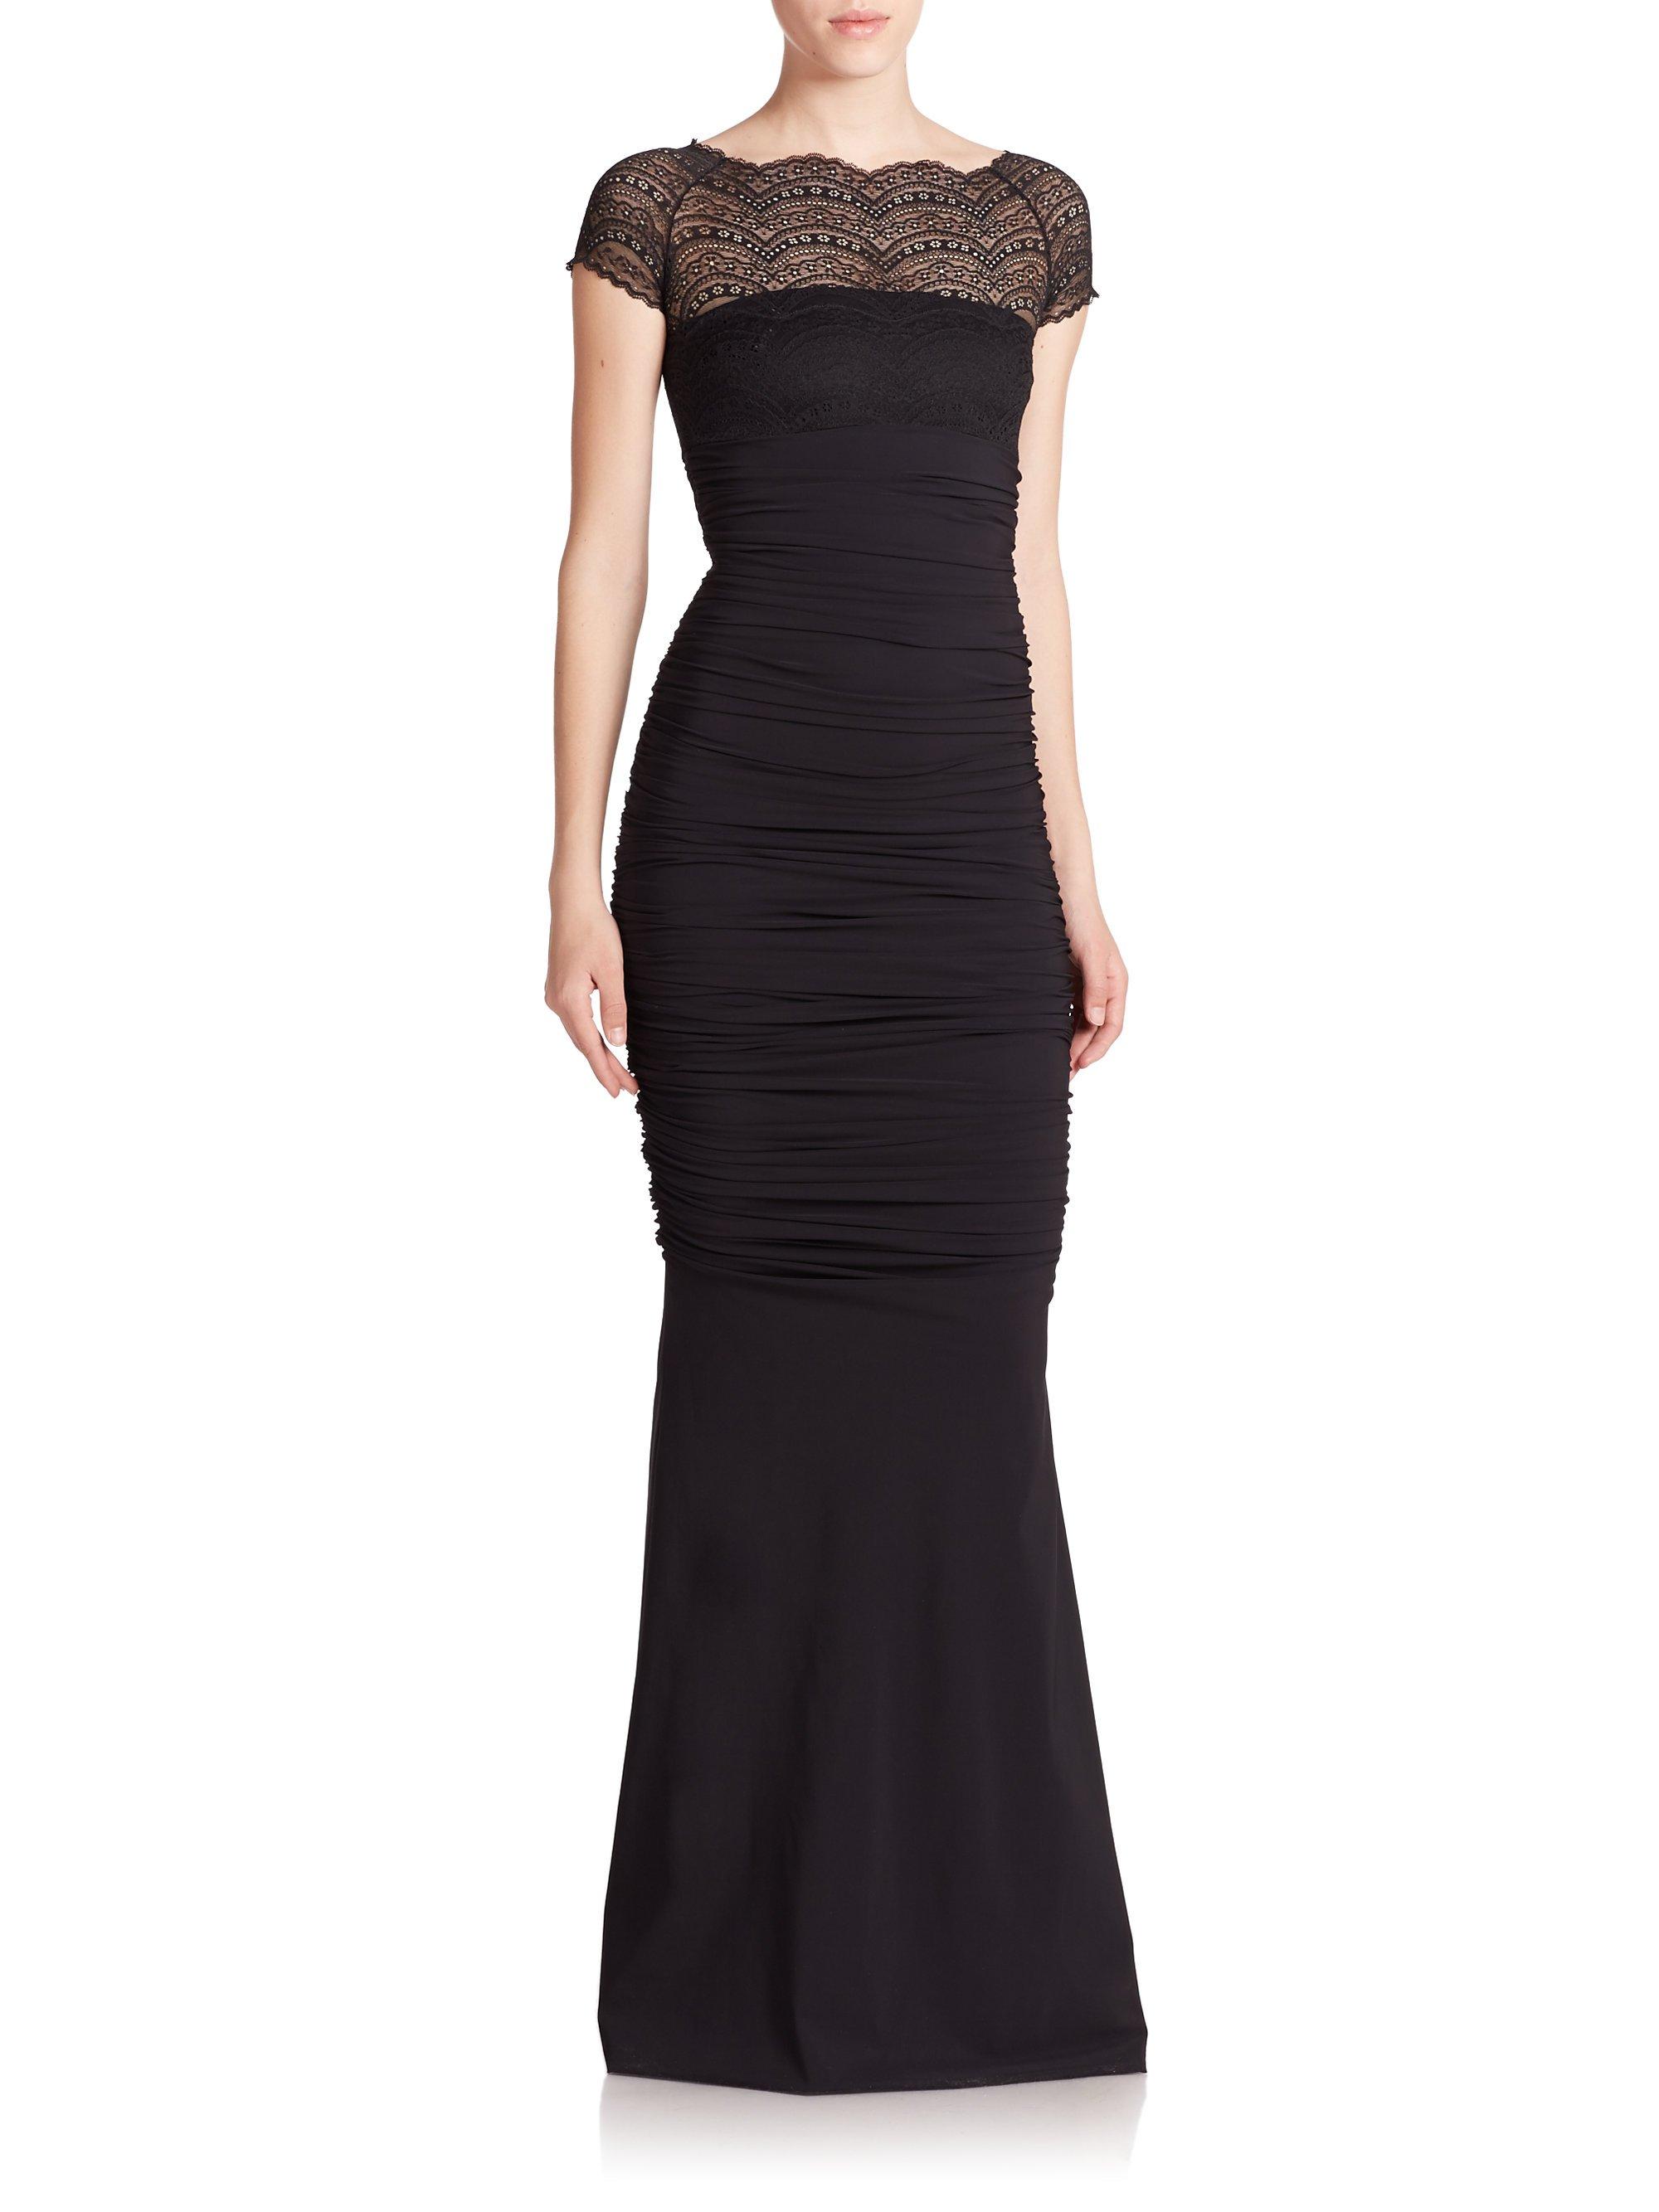 aacb106cd16 La Petite Robe Di Chiara Boni Lace-top Illusion Gown in Black - Lyst